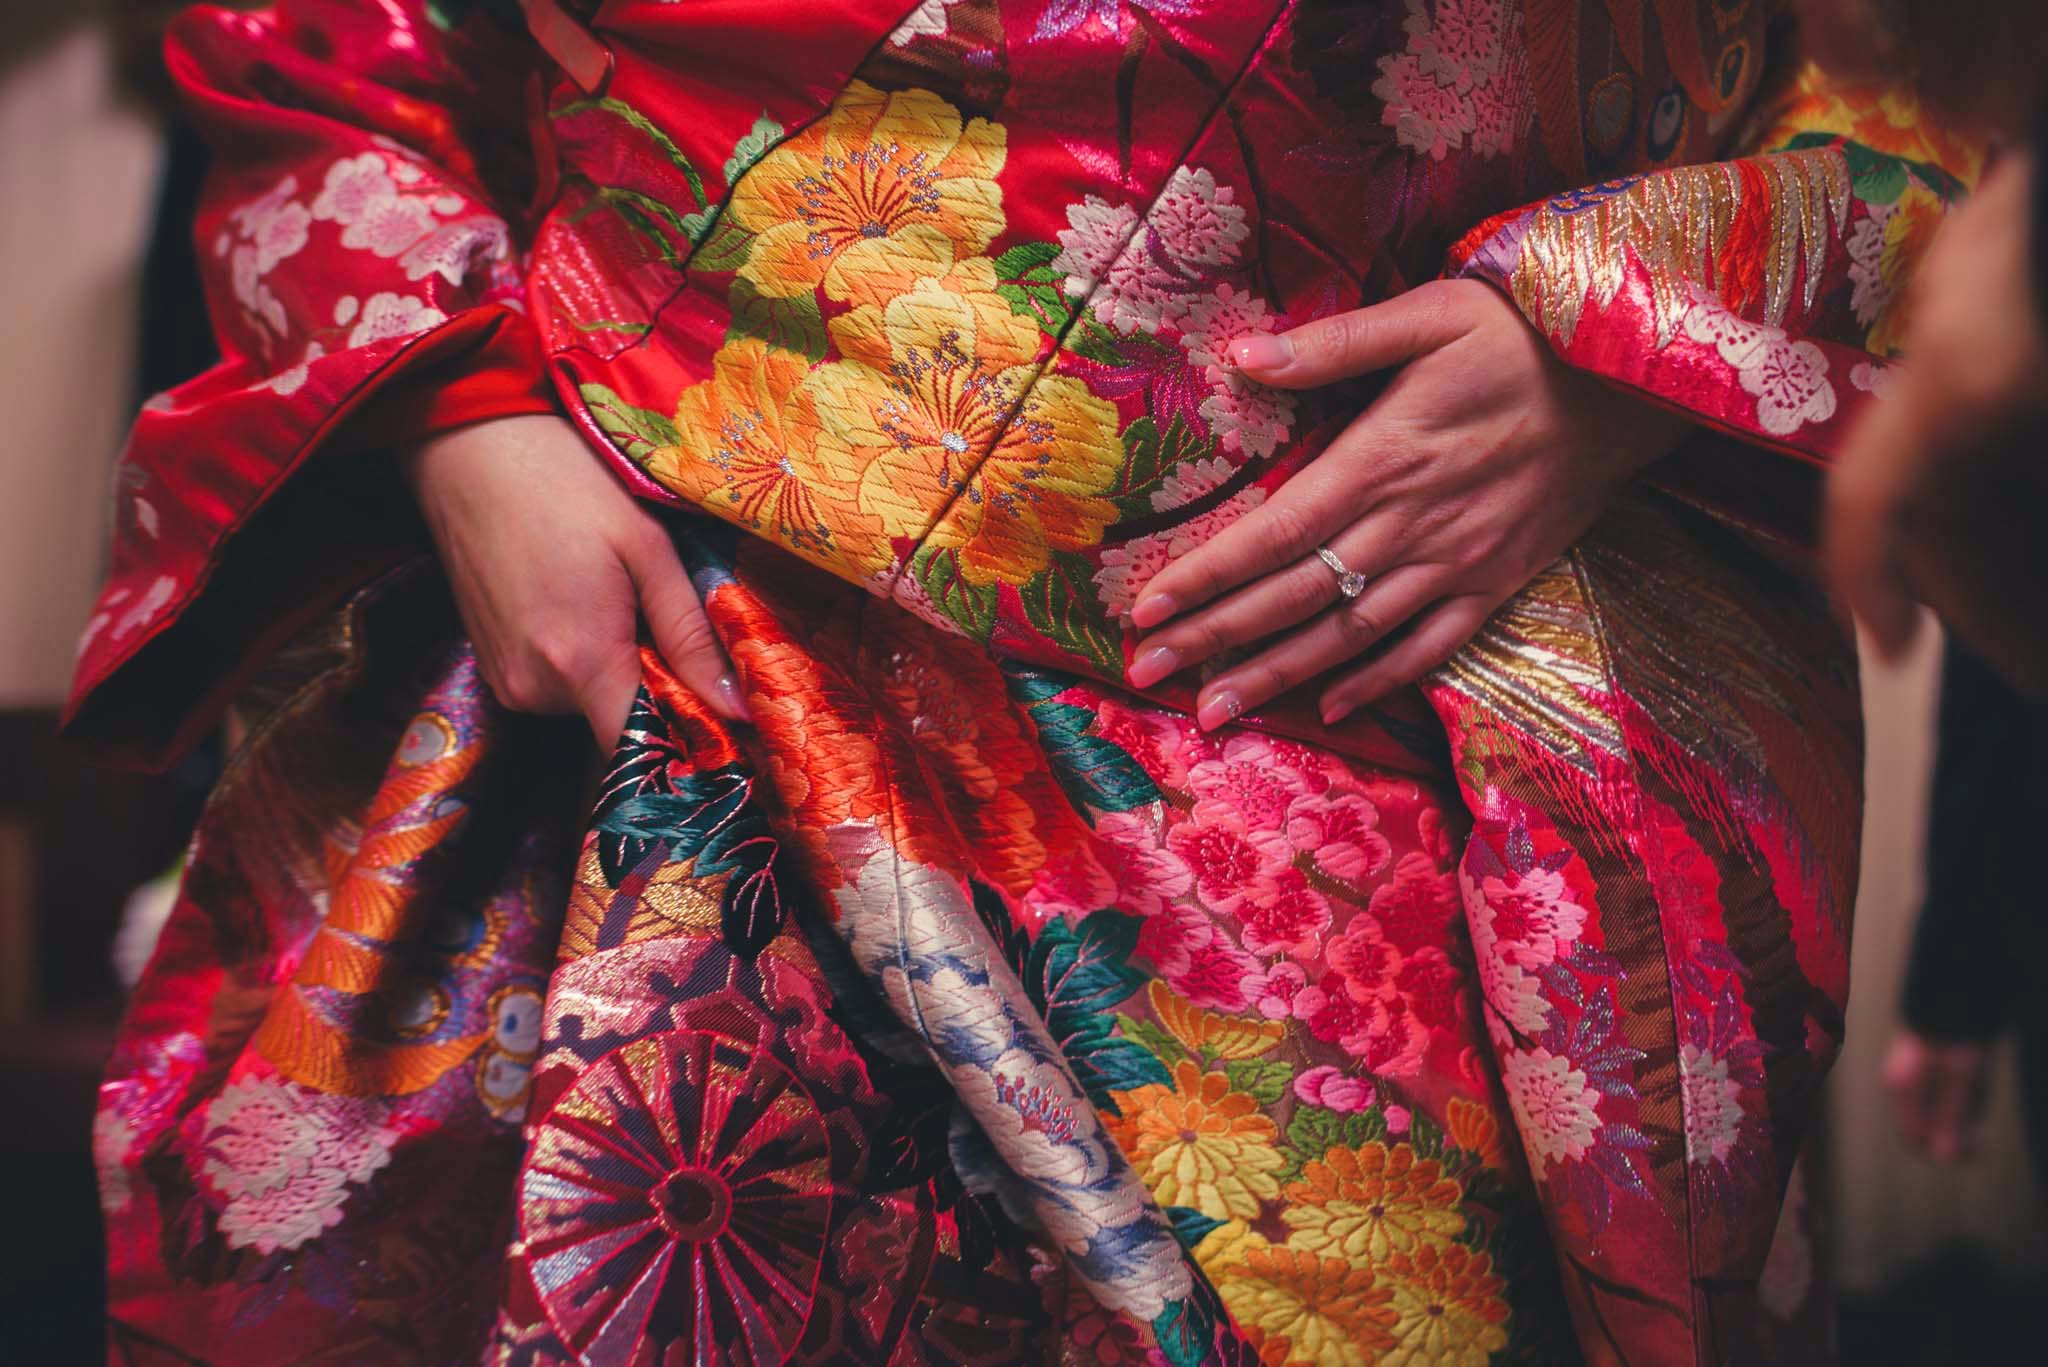 japan-wedding-photography-by-roberto-panciatici-photography-20